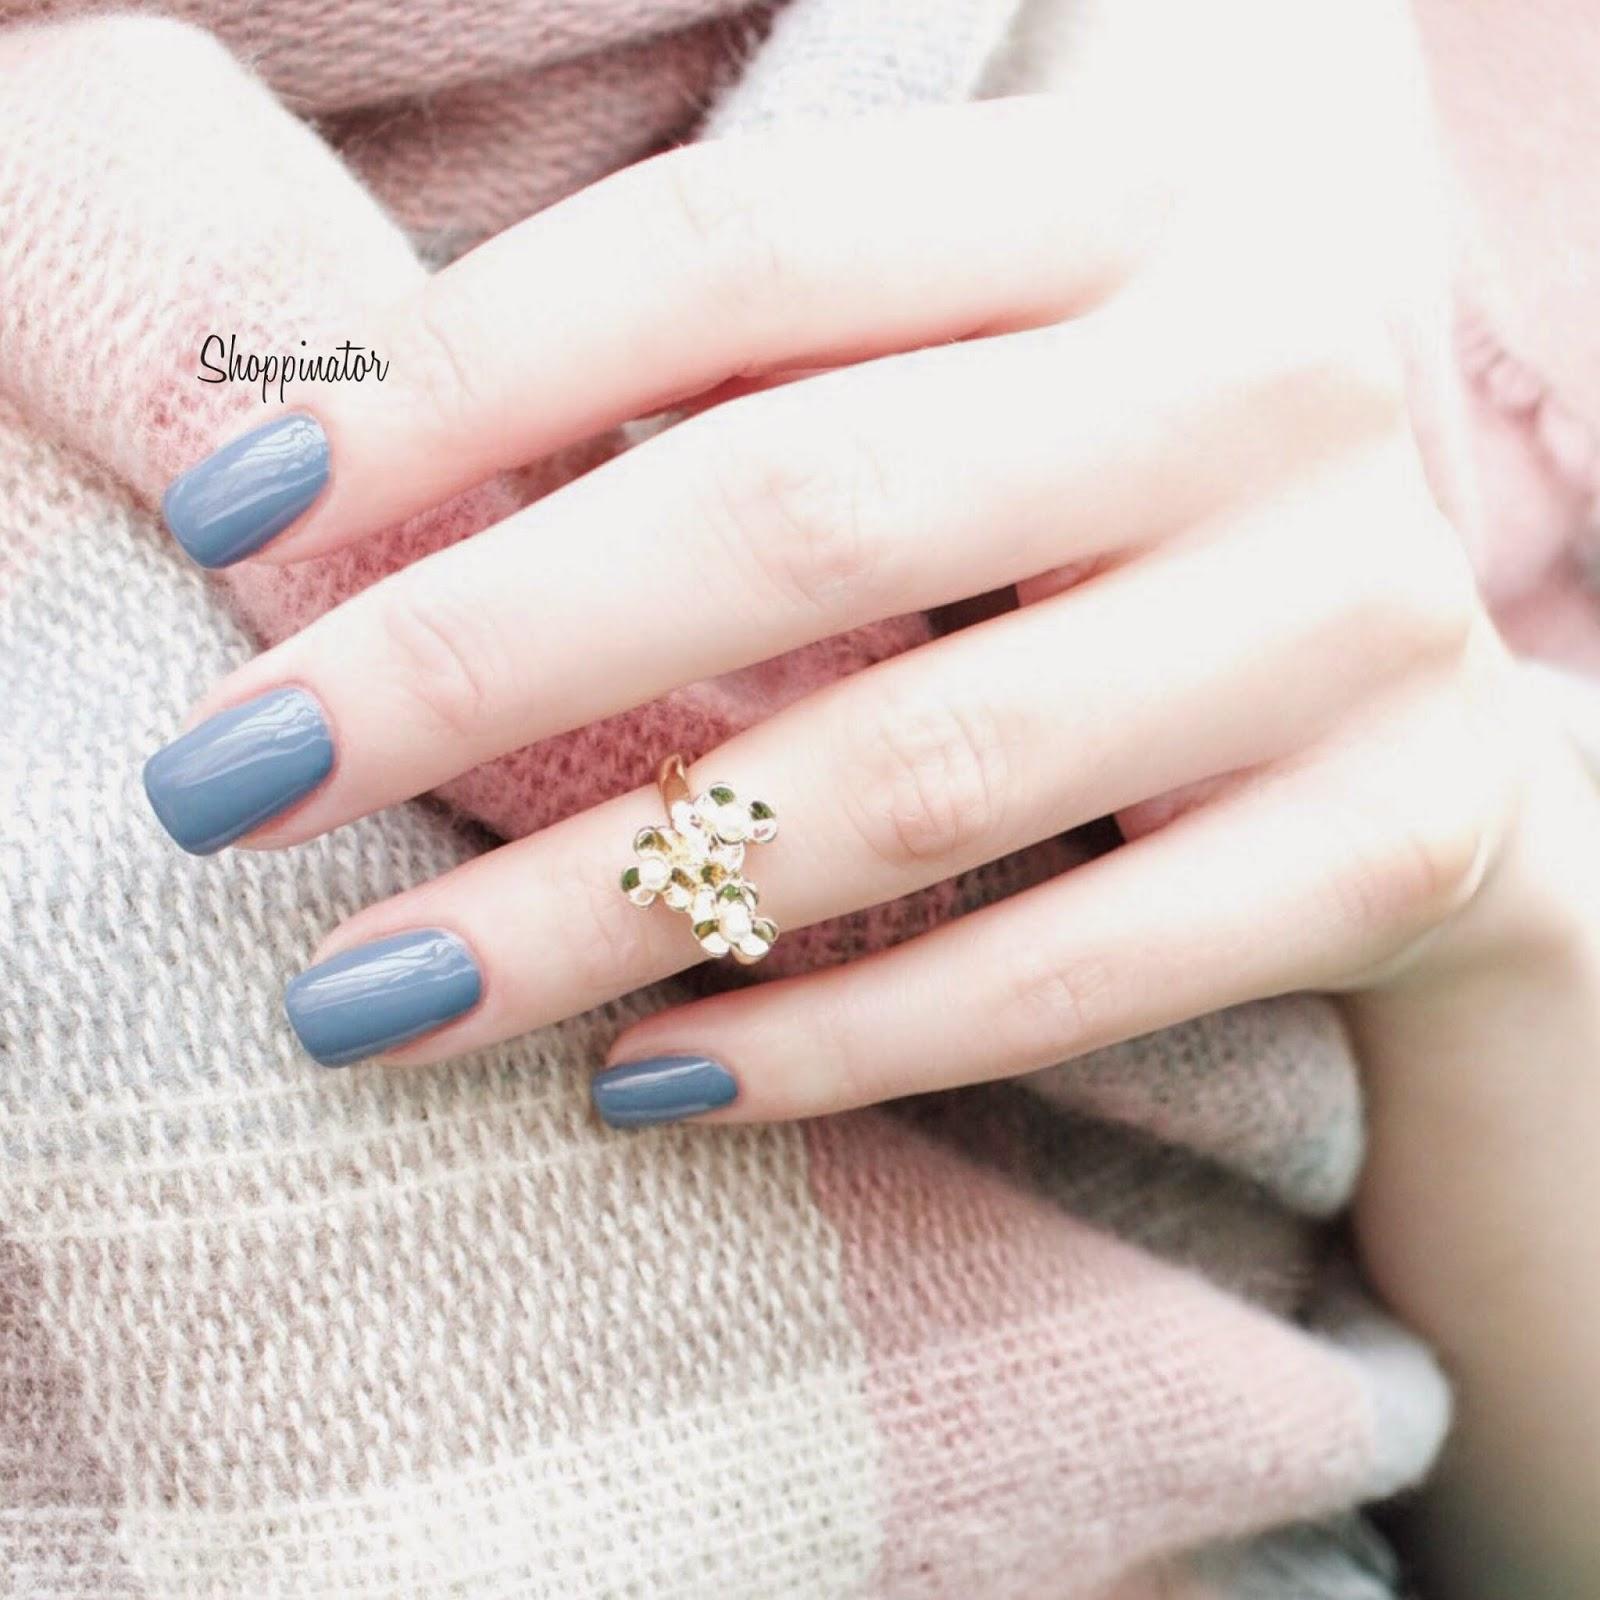 Anny-Blue-Fashion-Show-Swatch-Shoppinator-Nagellack-Notd-Nailpolish